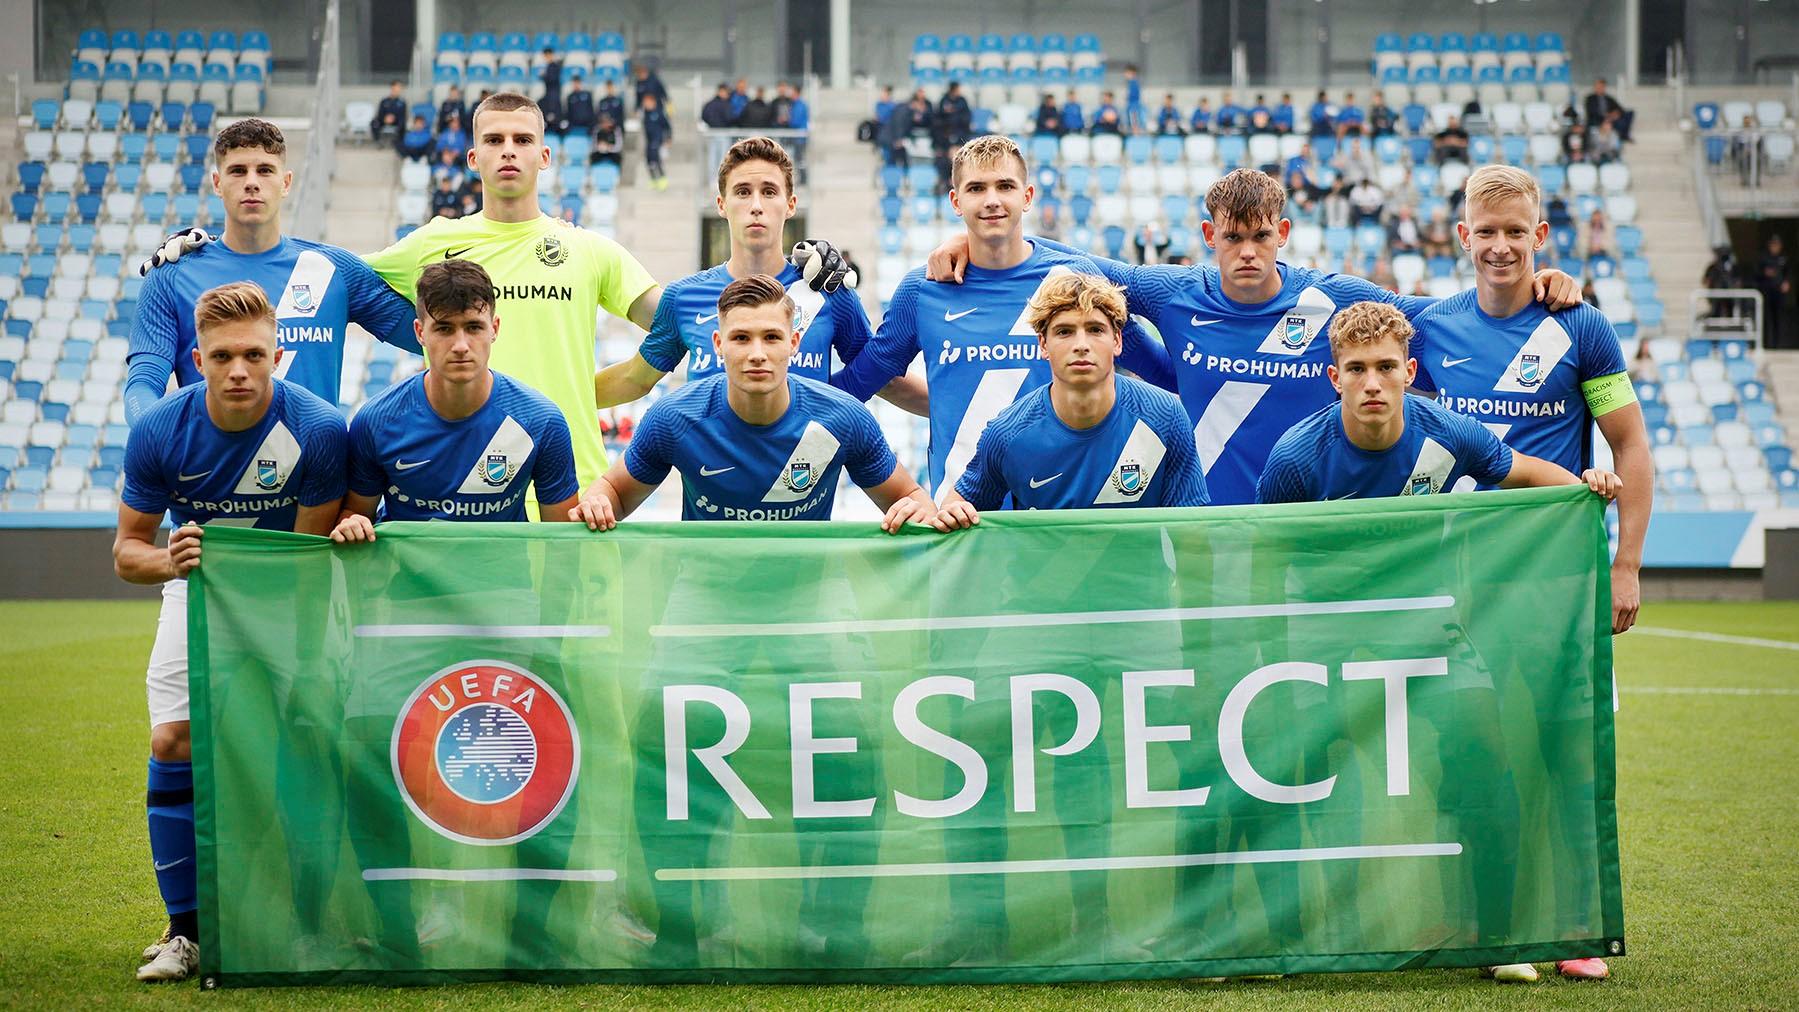 Képgaléria: MTK Budapest U19 - AC Sparta Praha U19 3-1